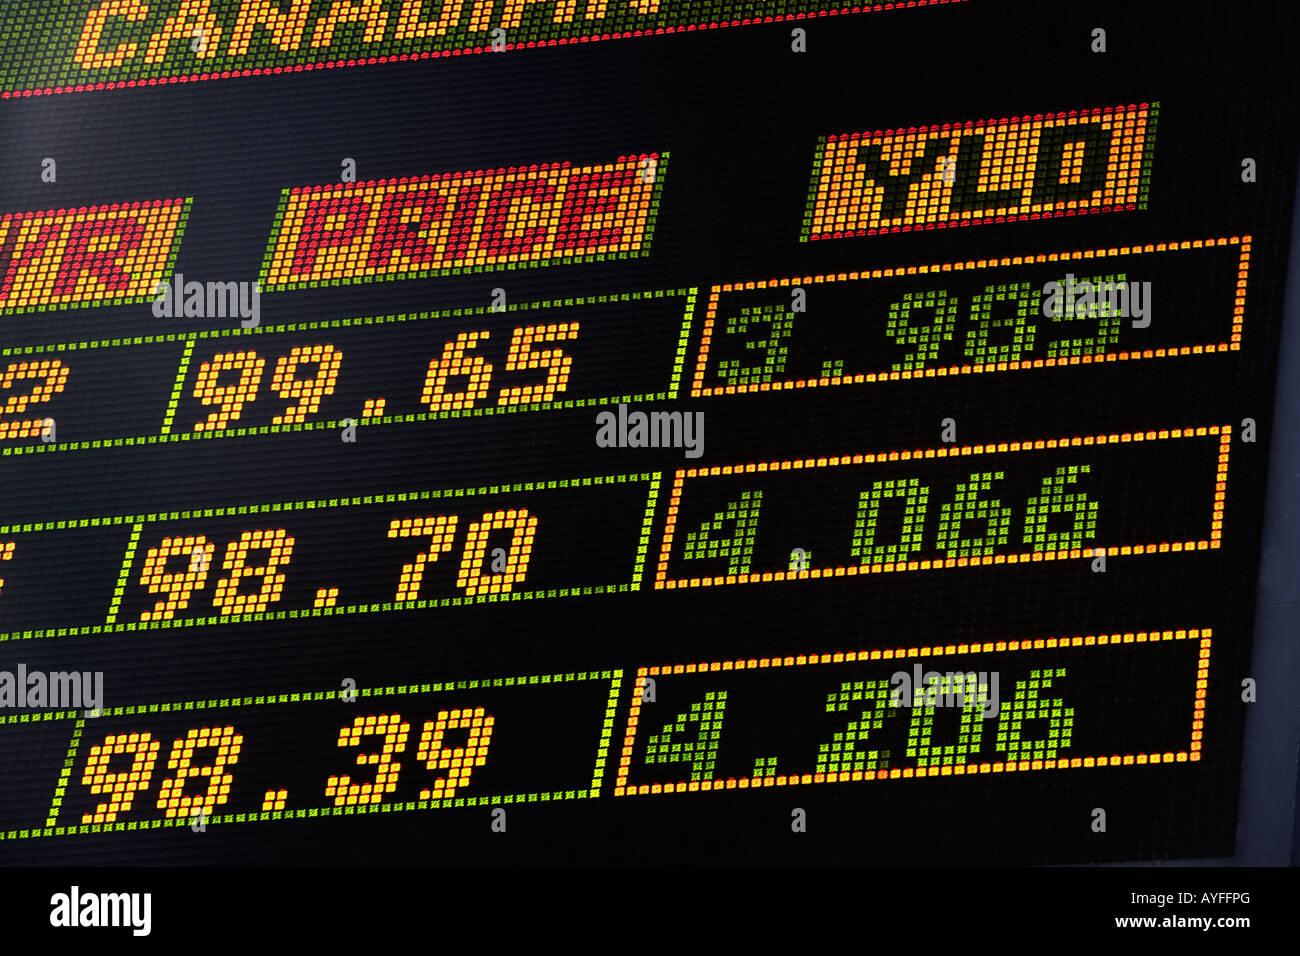 bond prices, yield - Stock Image